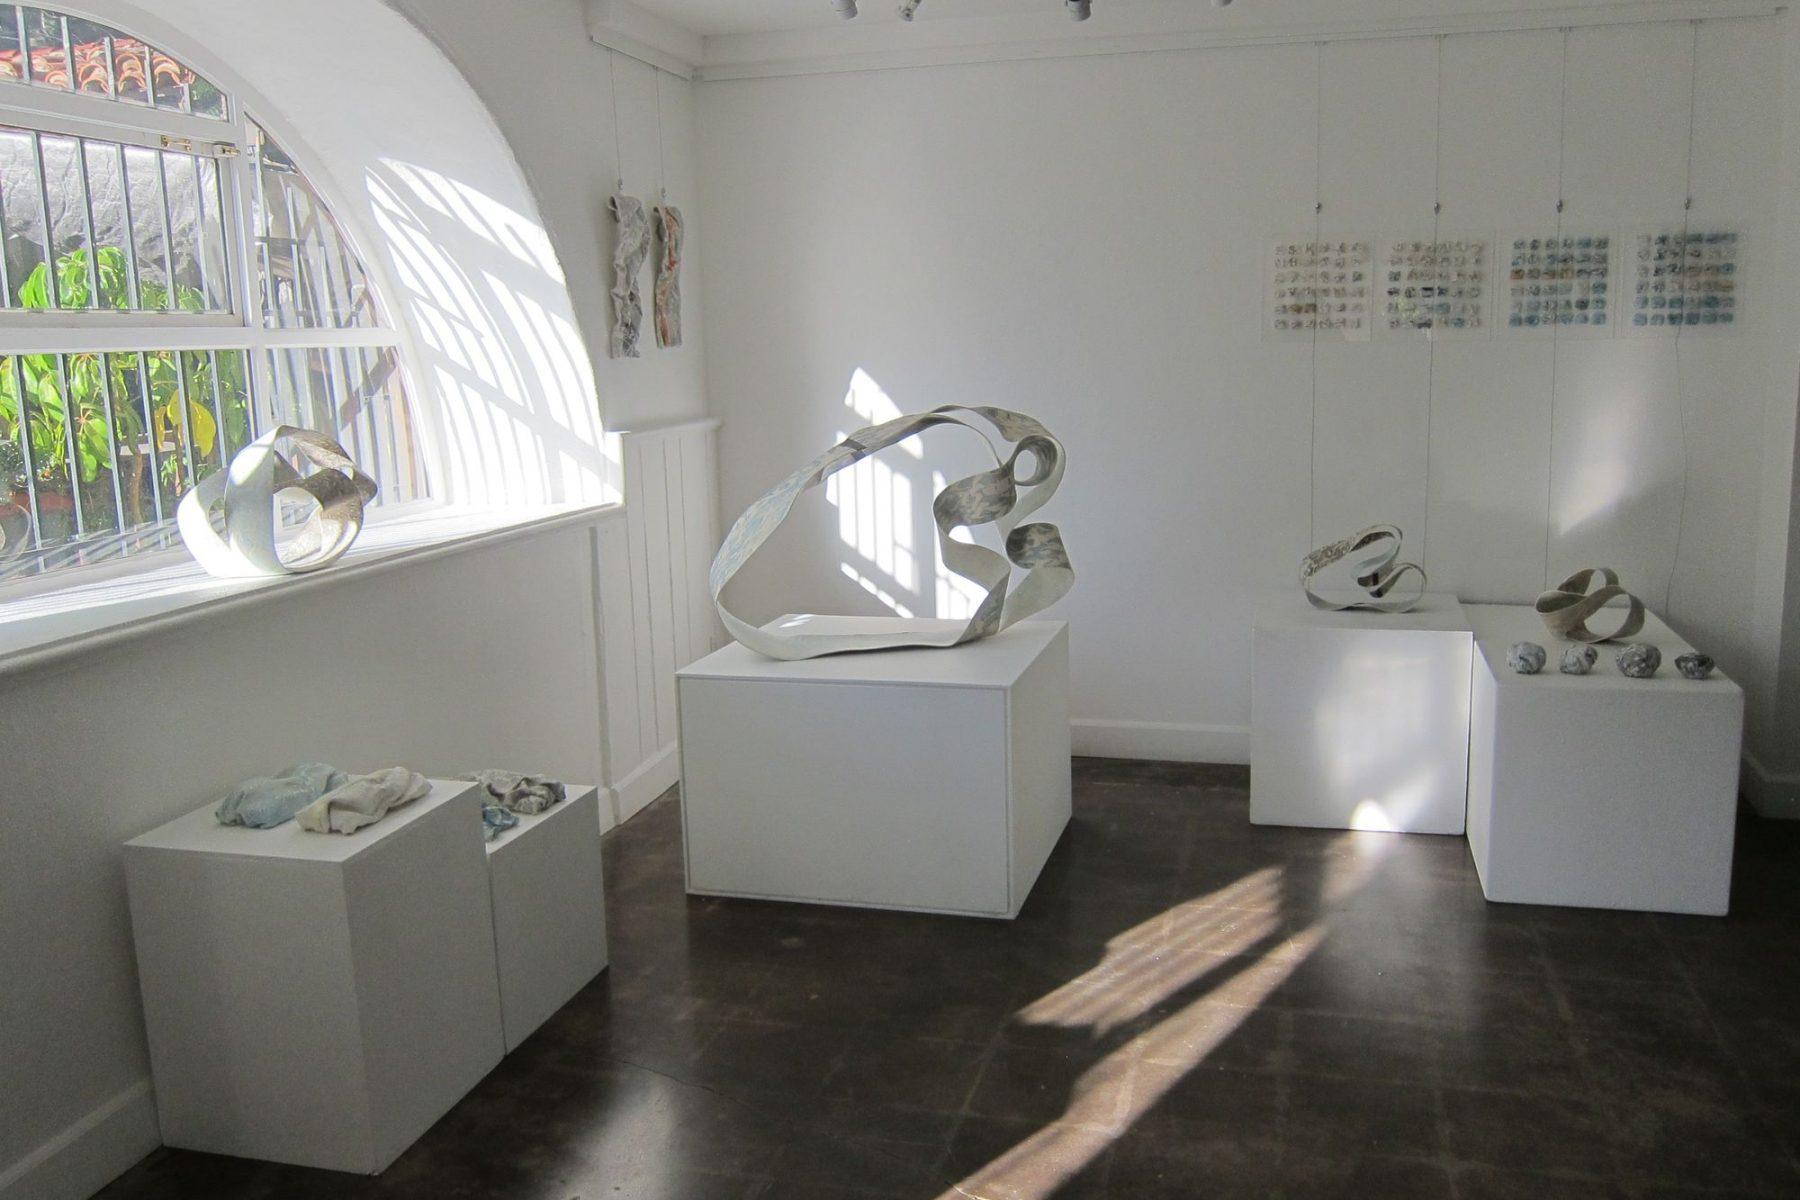 http://schlagenhauf-ceramique.com/wp-content/uploads/2017/08/Daniela-Serie-exposition-San-Diego-1800x1200.jpg